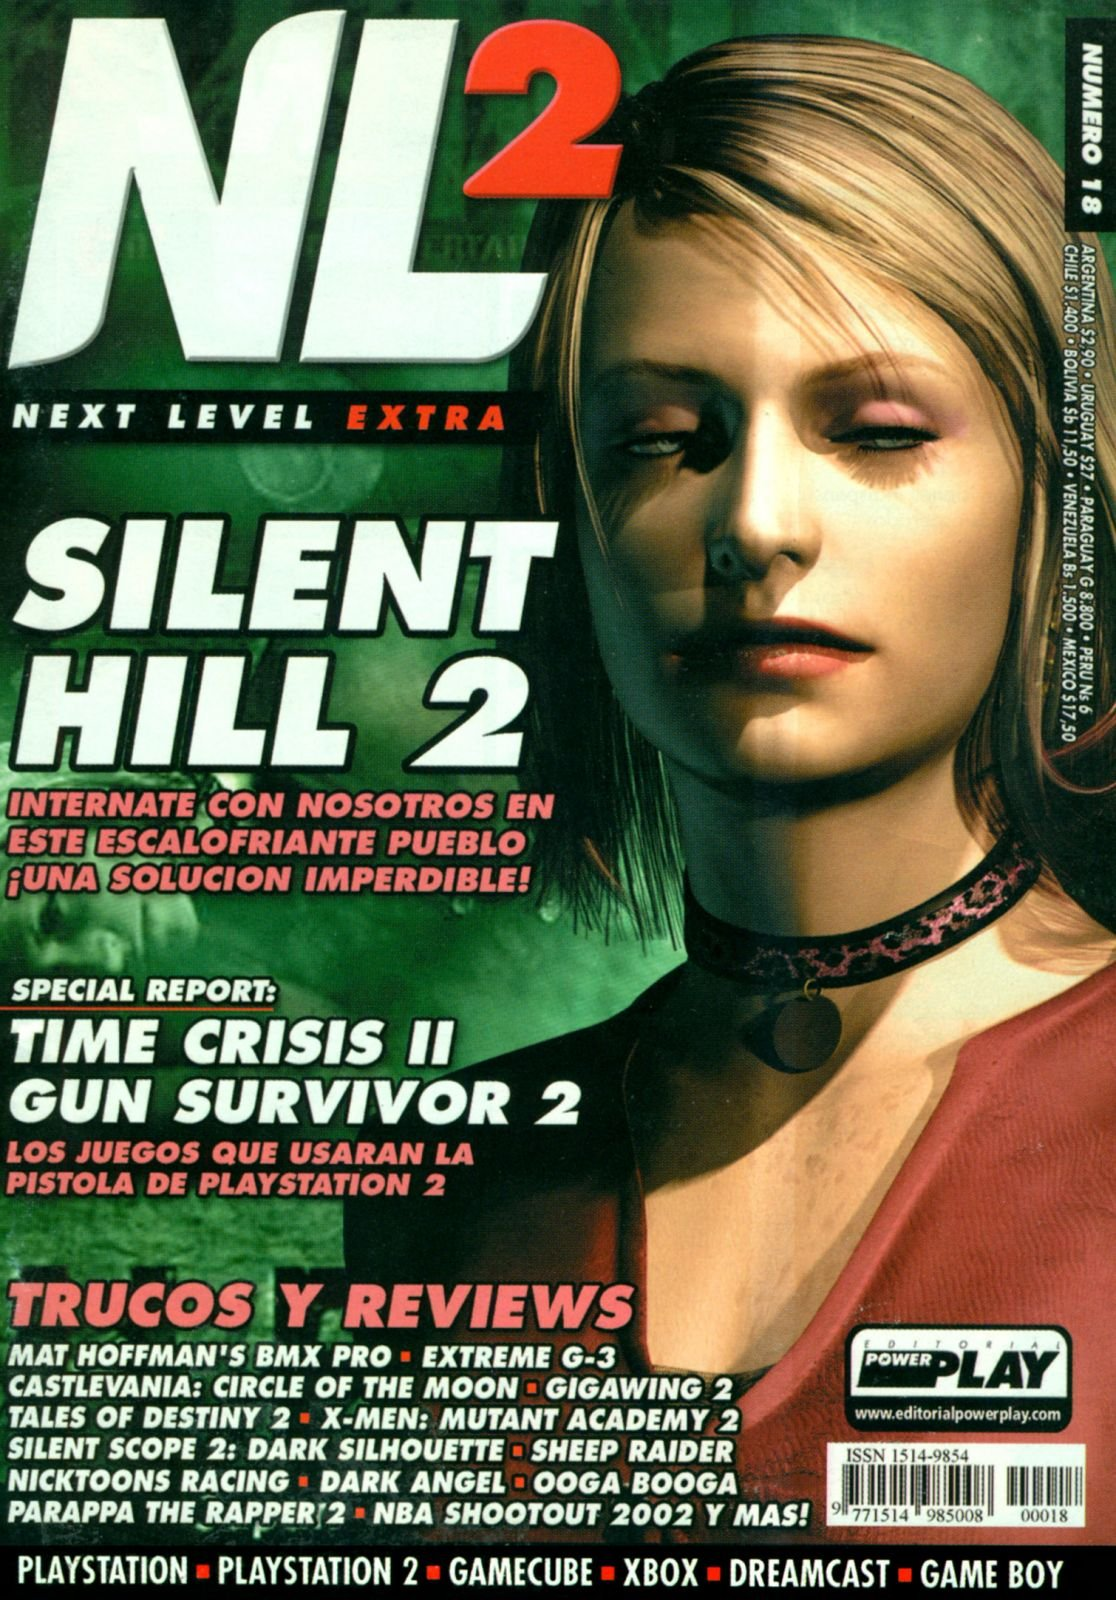 Next Level Extra 18 October 2001